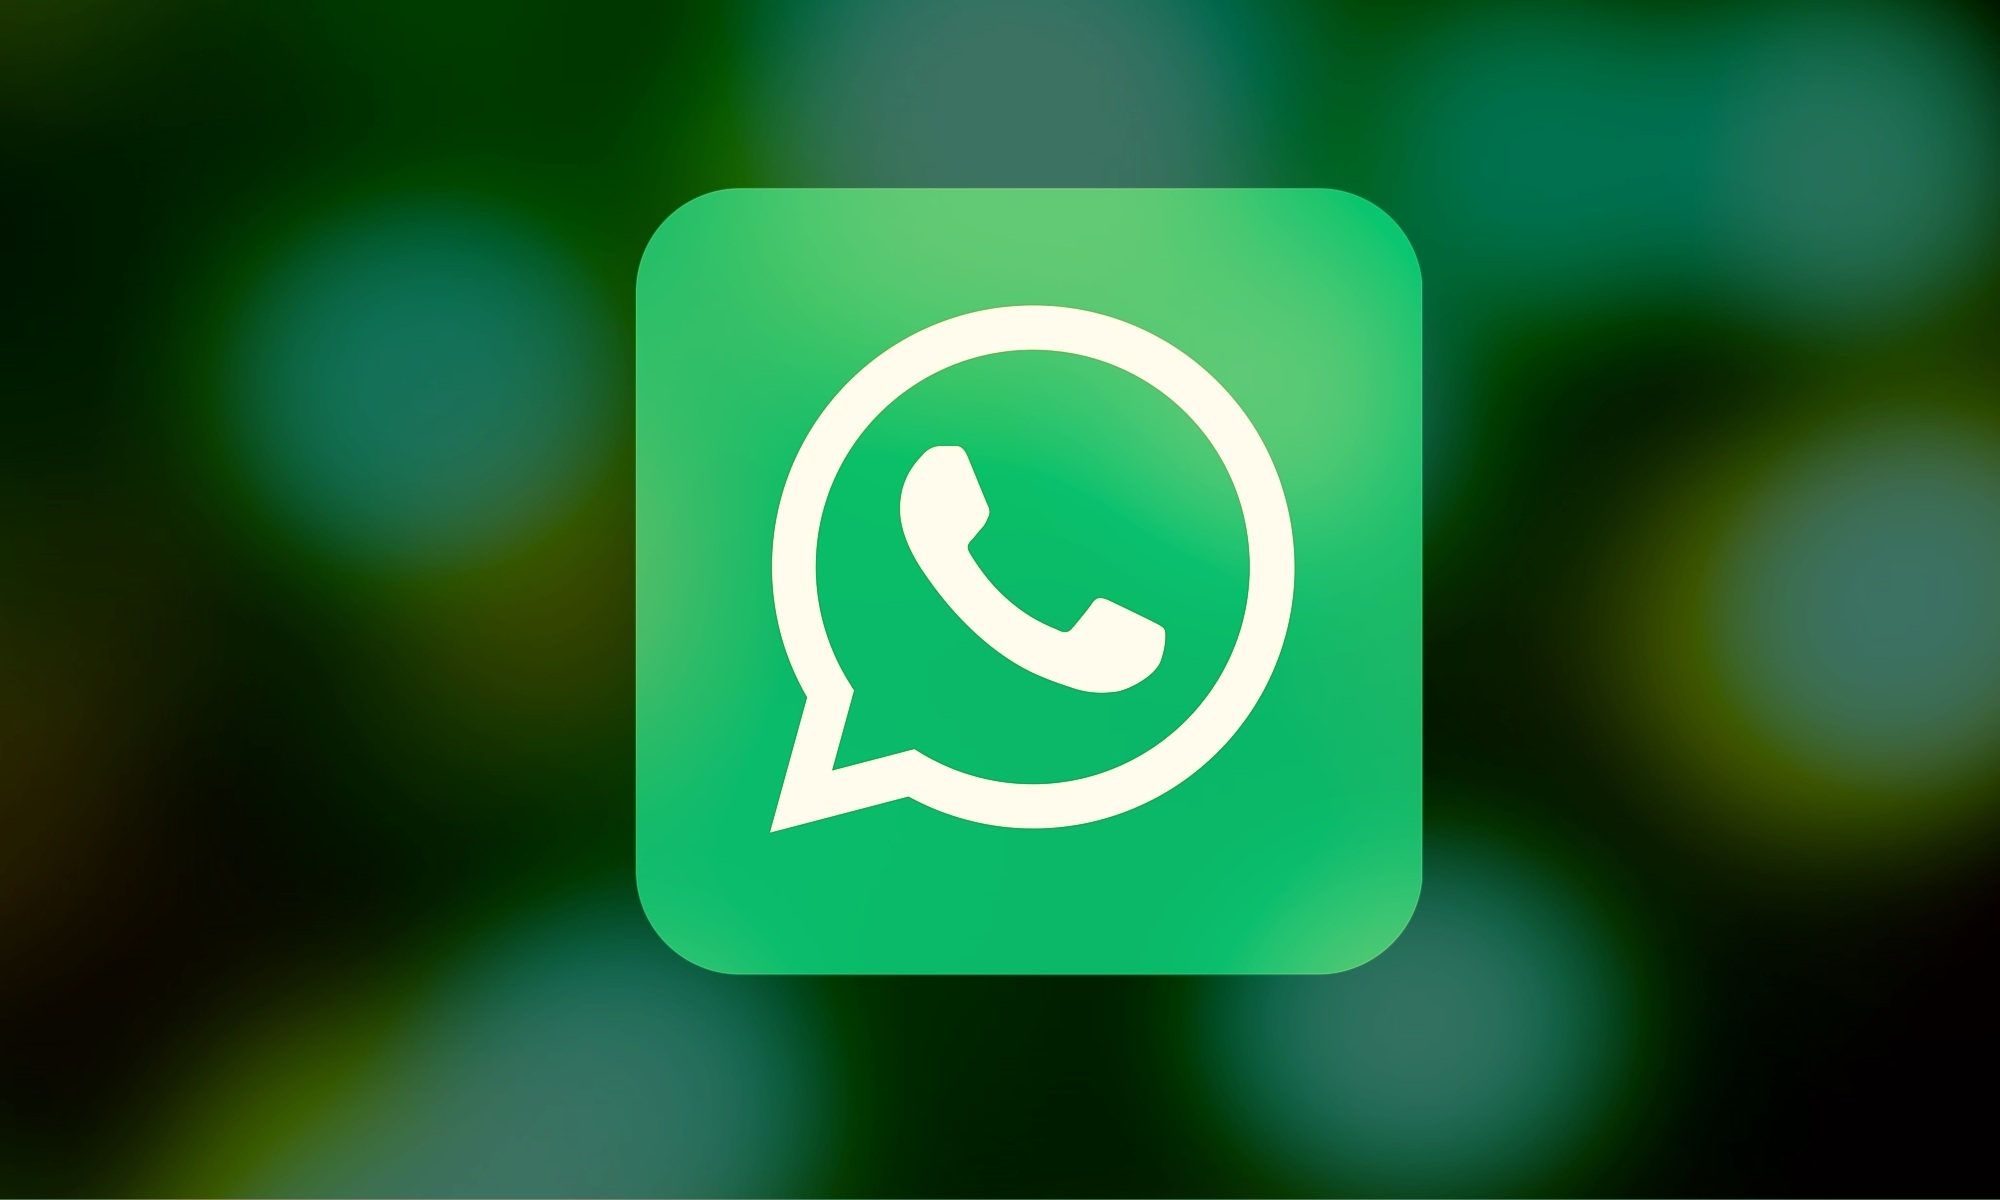 Cerco gruppi whatsapp Link